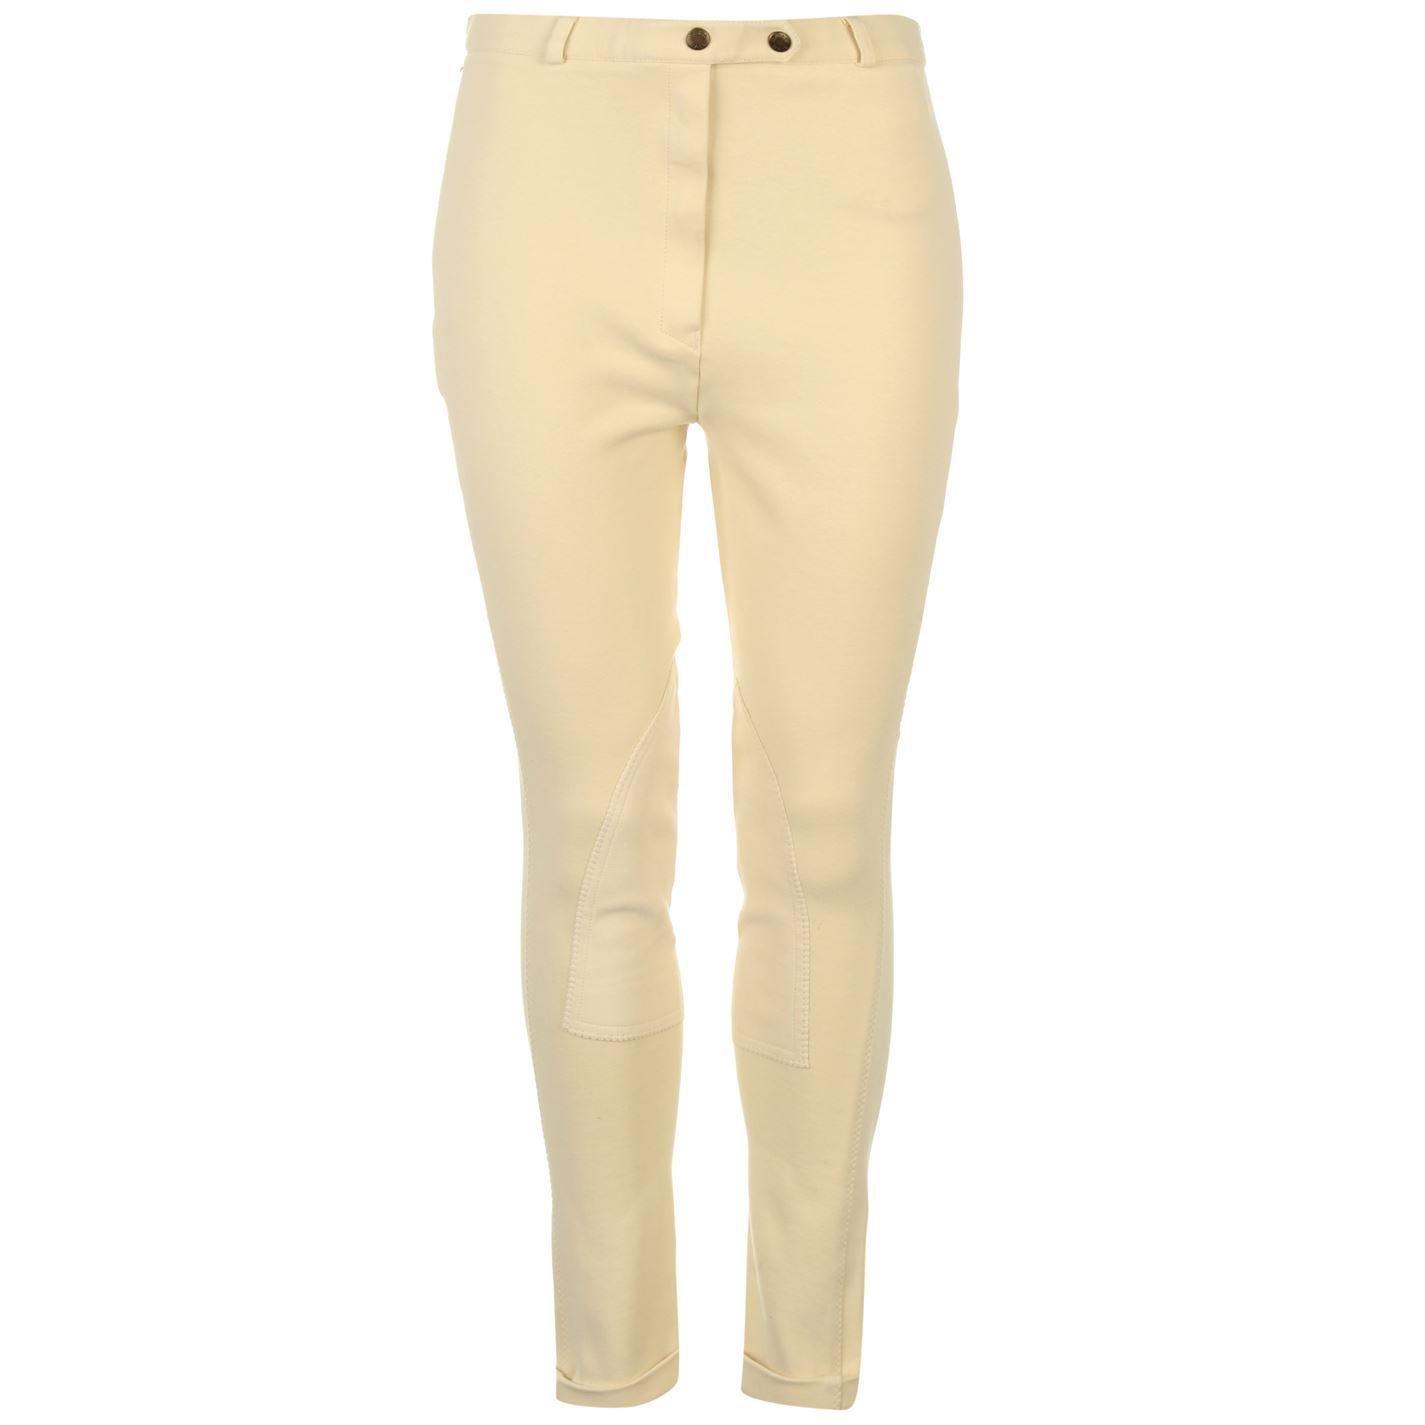 Harry Hall Womens Ladies Atlanta Jodhpurs Pants Trousers Horse Rider Clothing